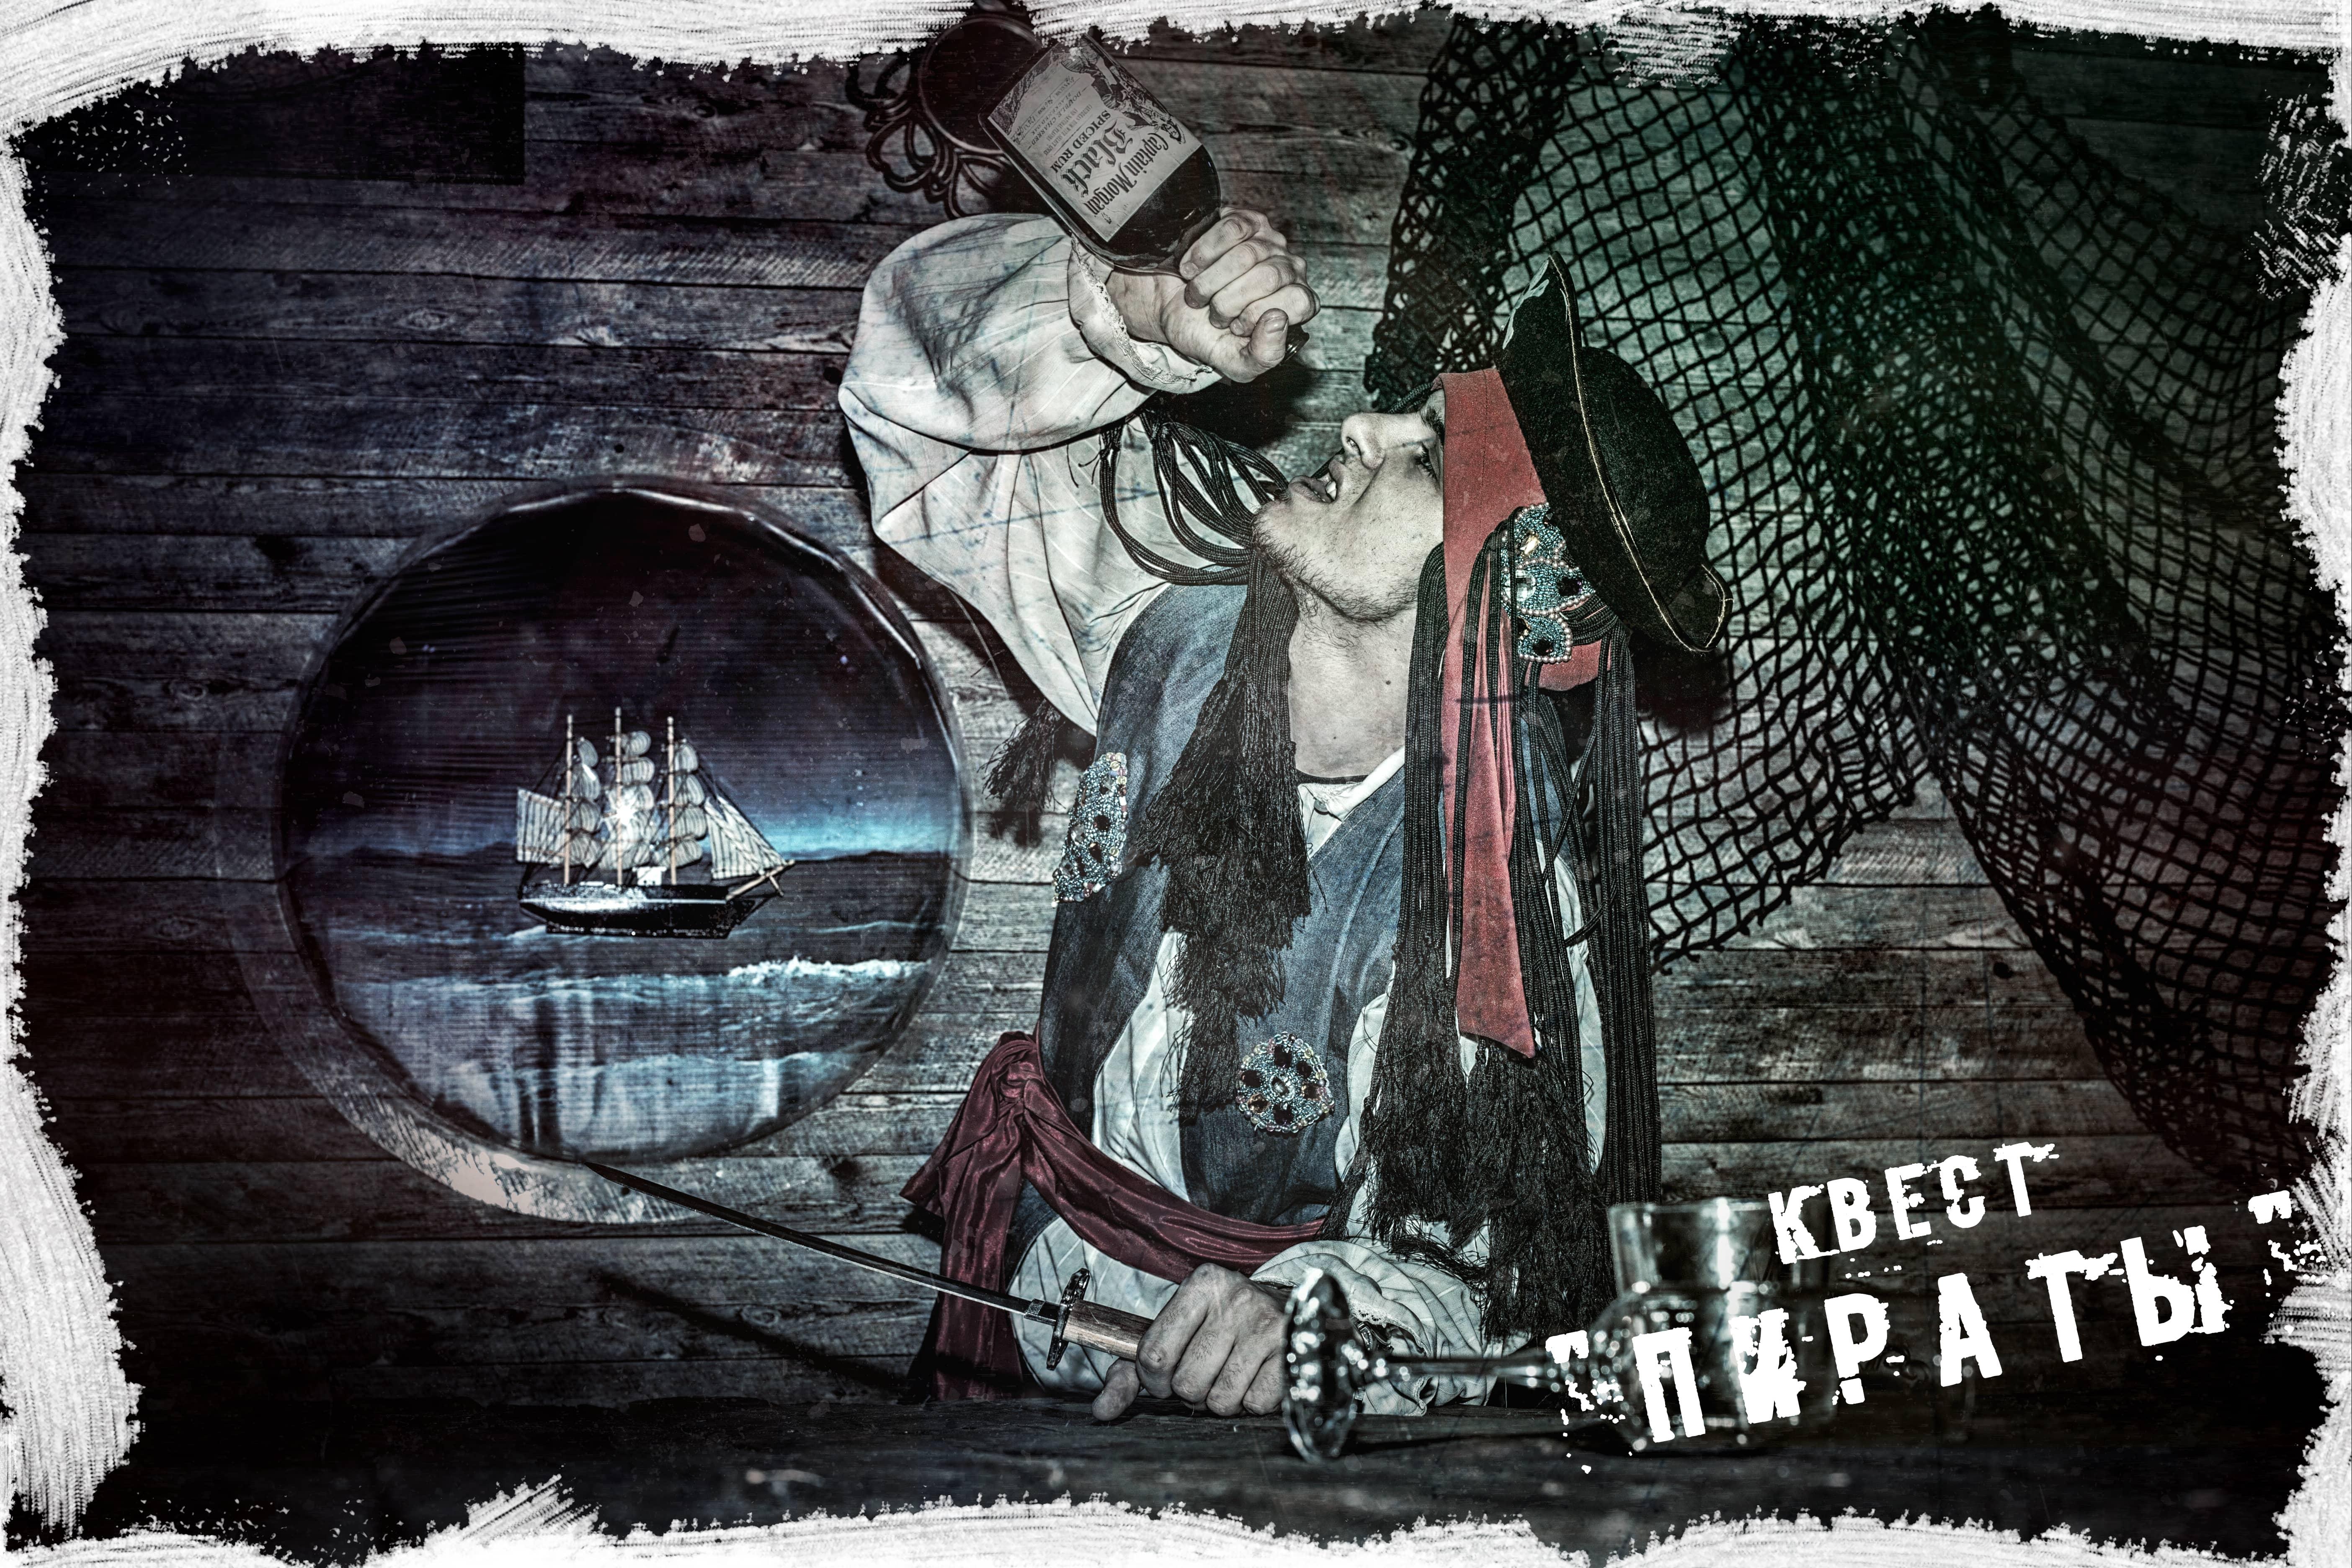 Квест Иркутск Пираты (3)